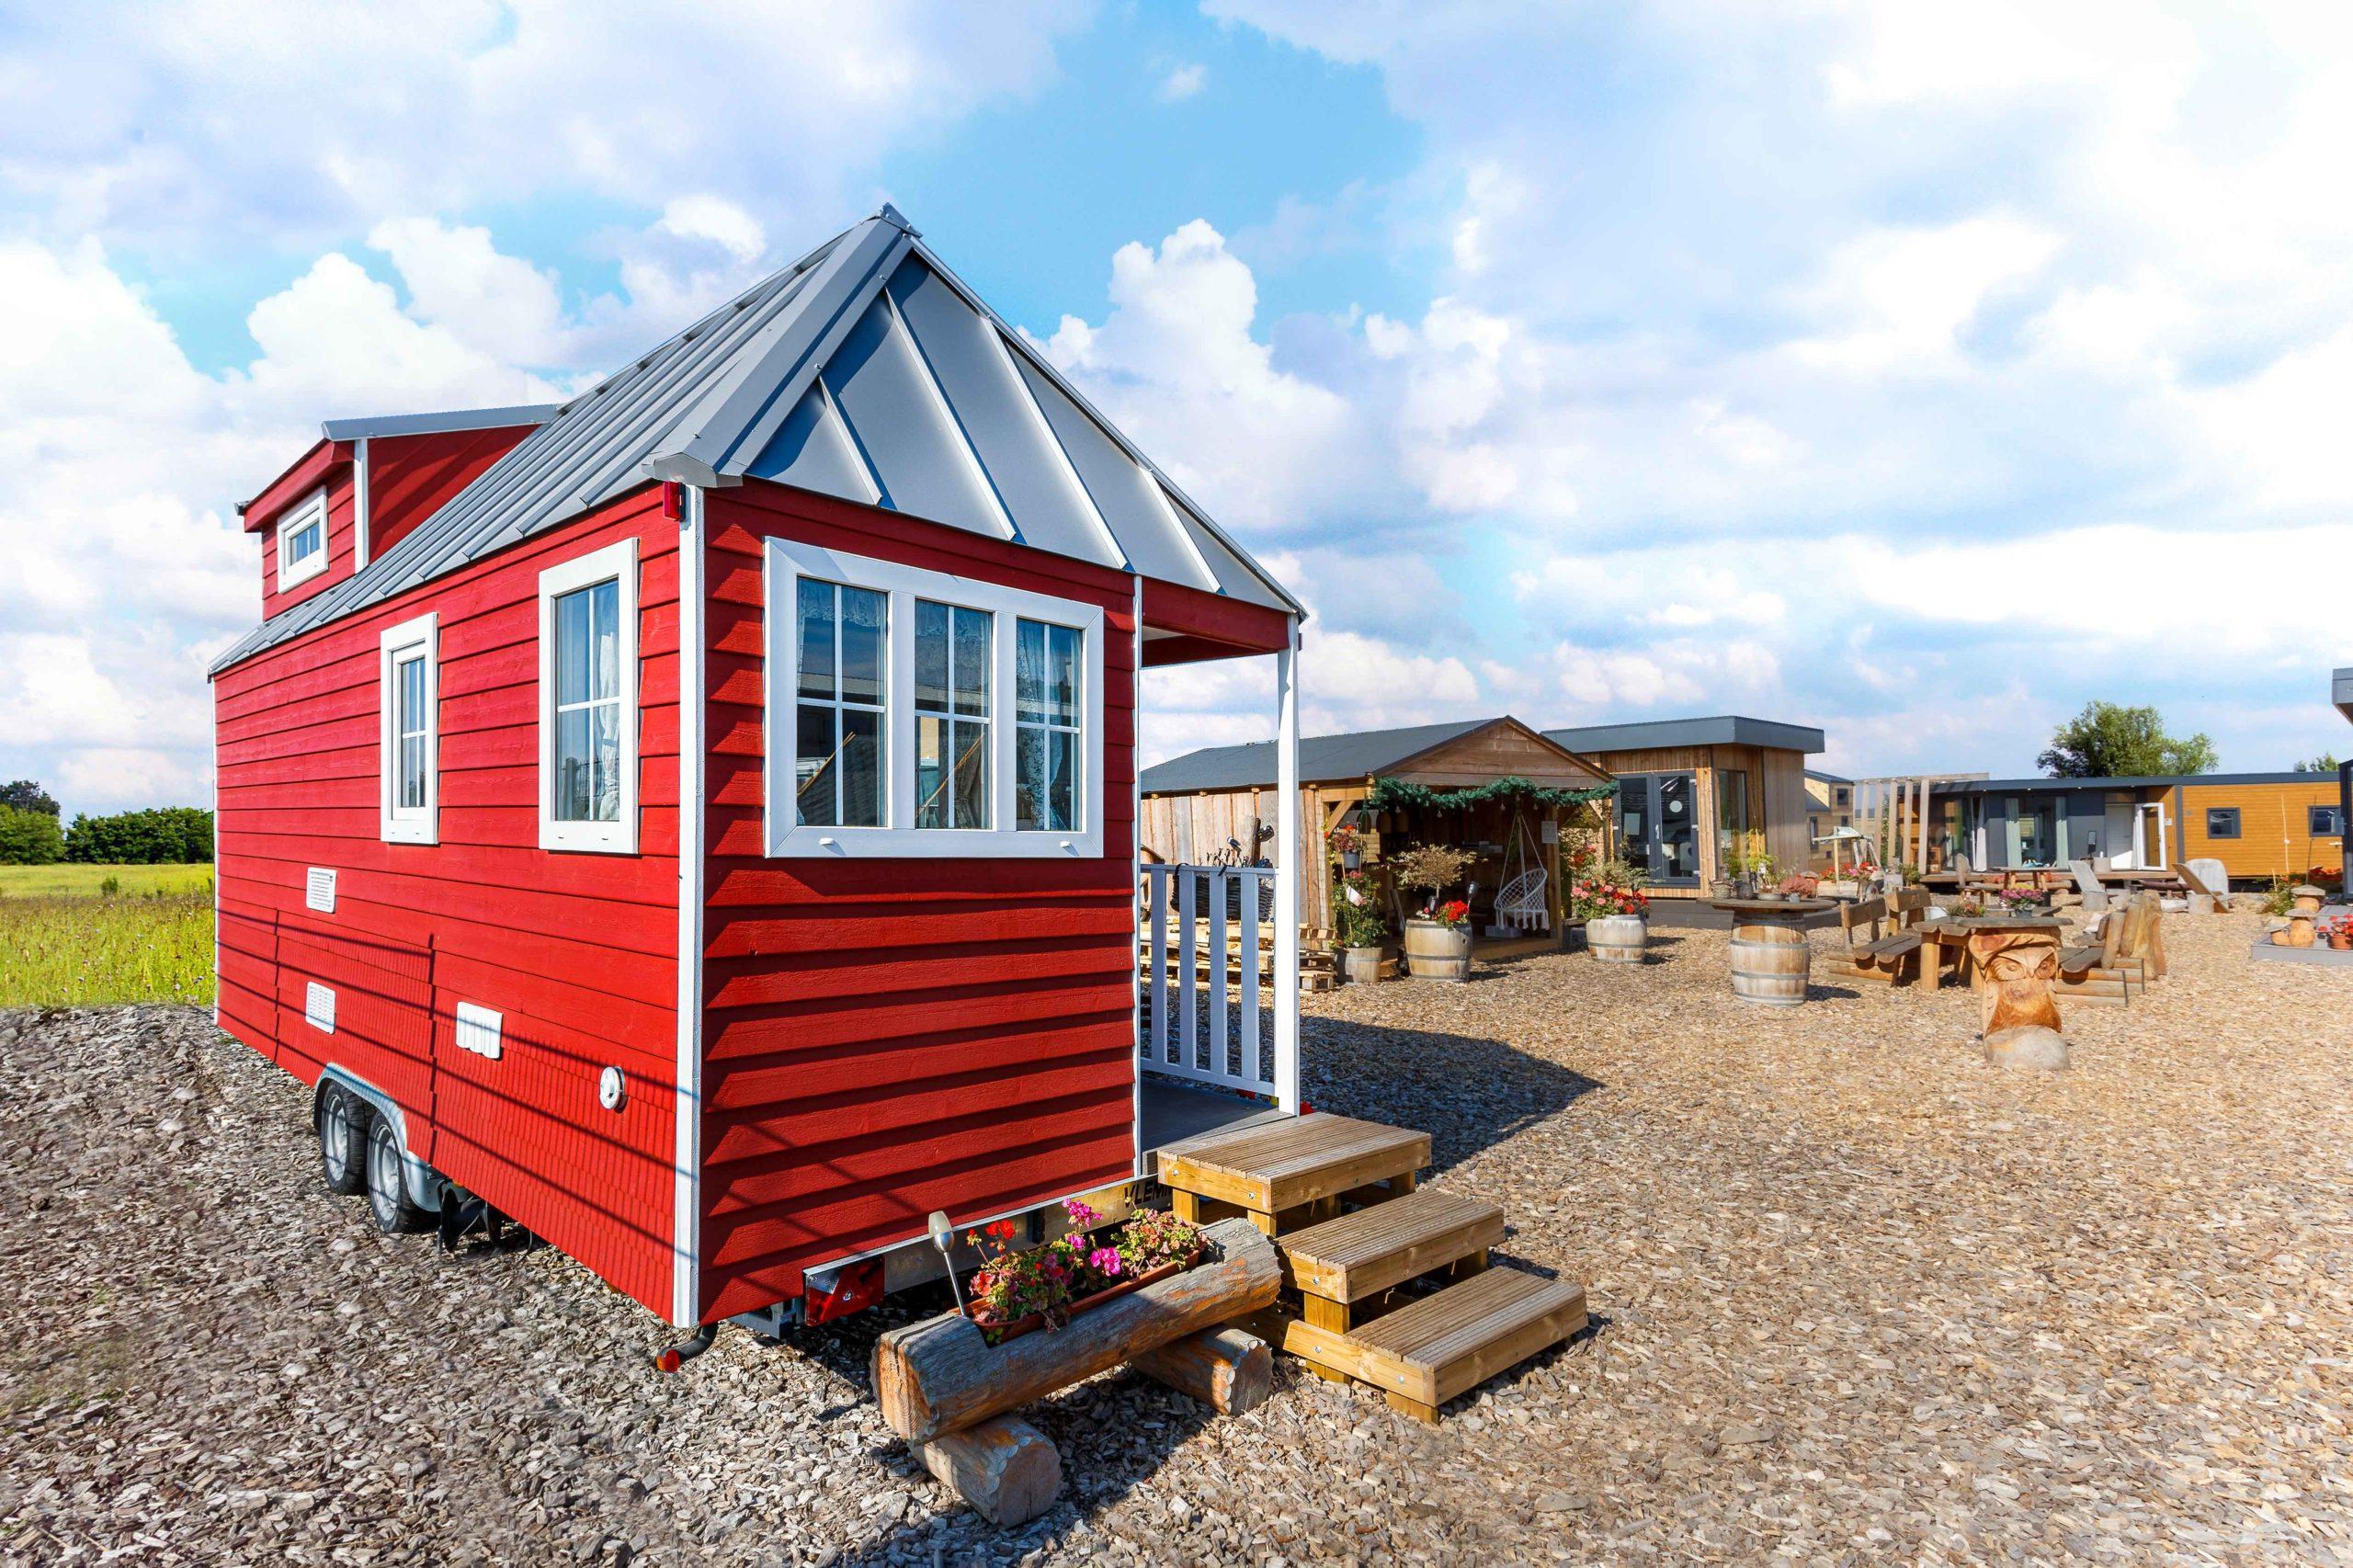 mobiles-tiny-house-schweden-vital-camp-gmbh-06